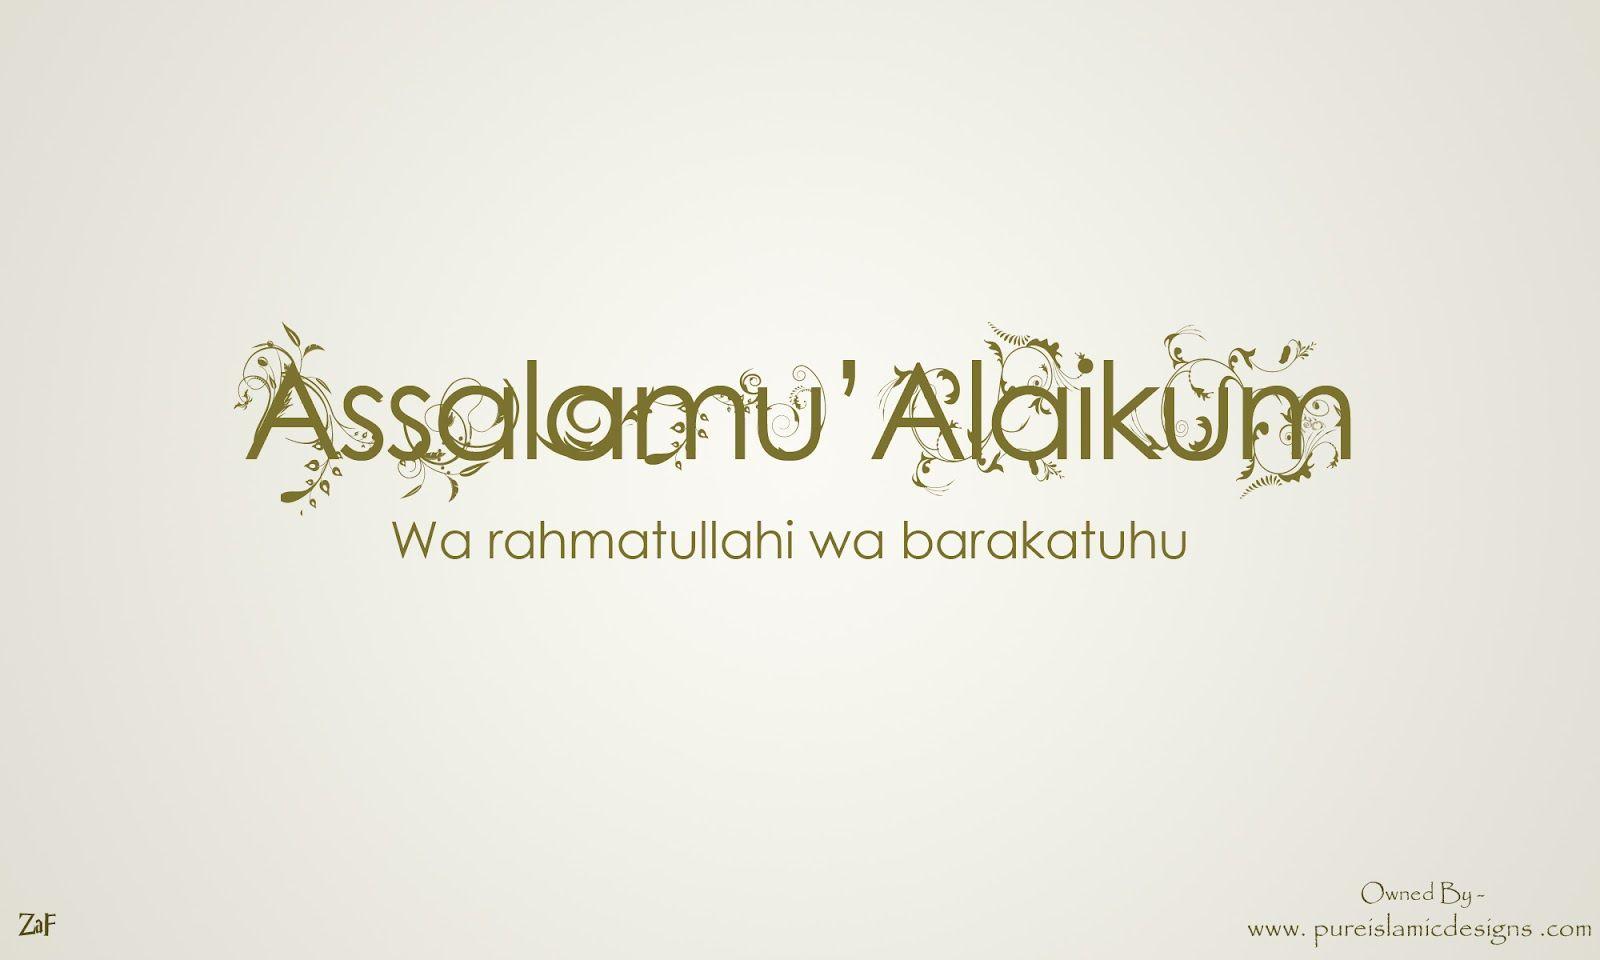 Free Download Assalamu Alaikum Islamic Wallpaper Pageresource